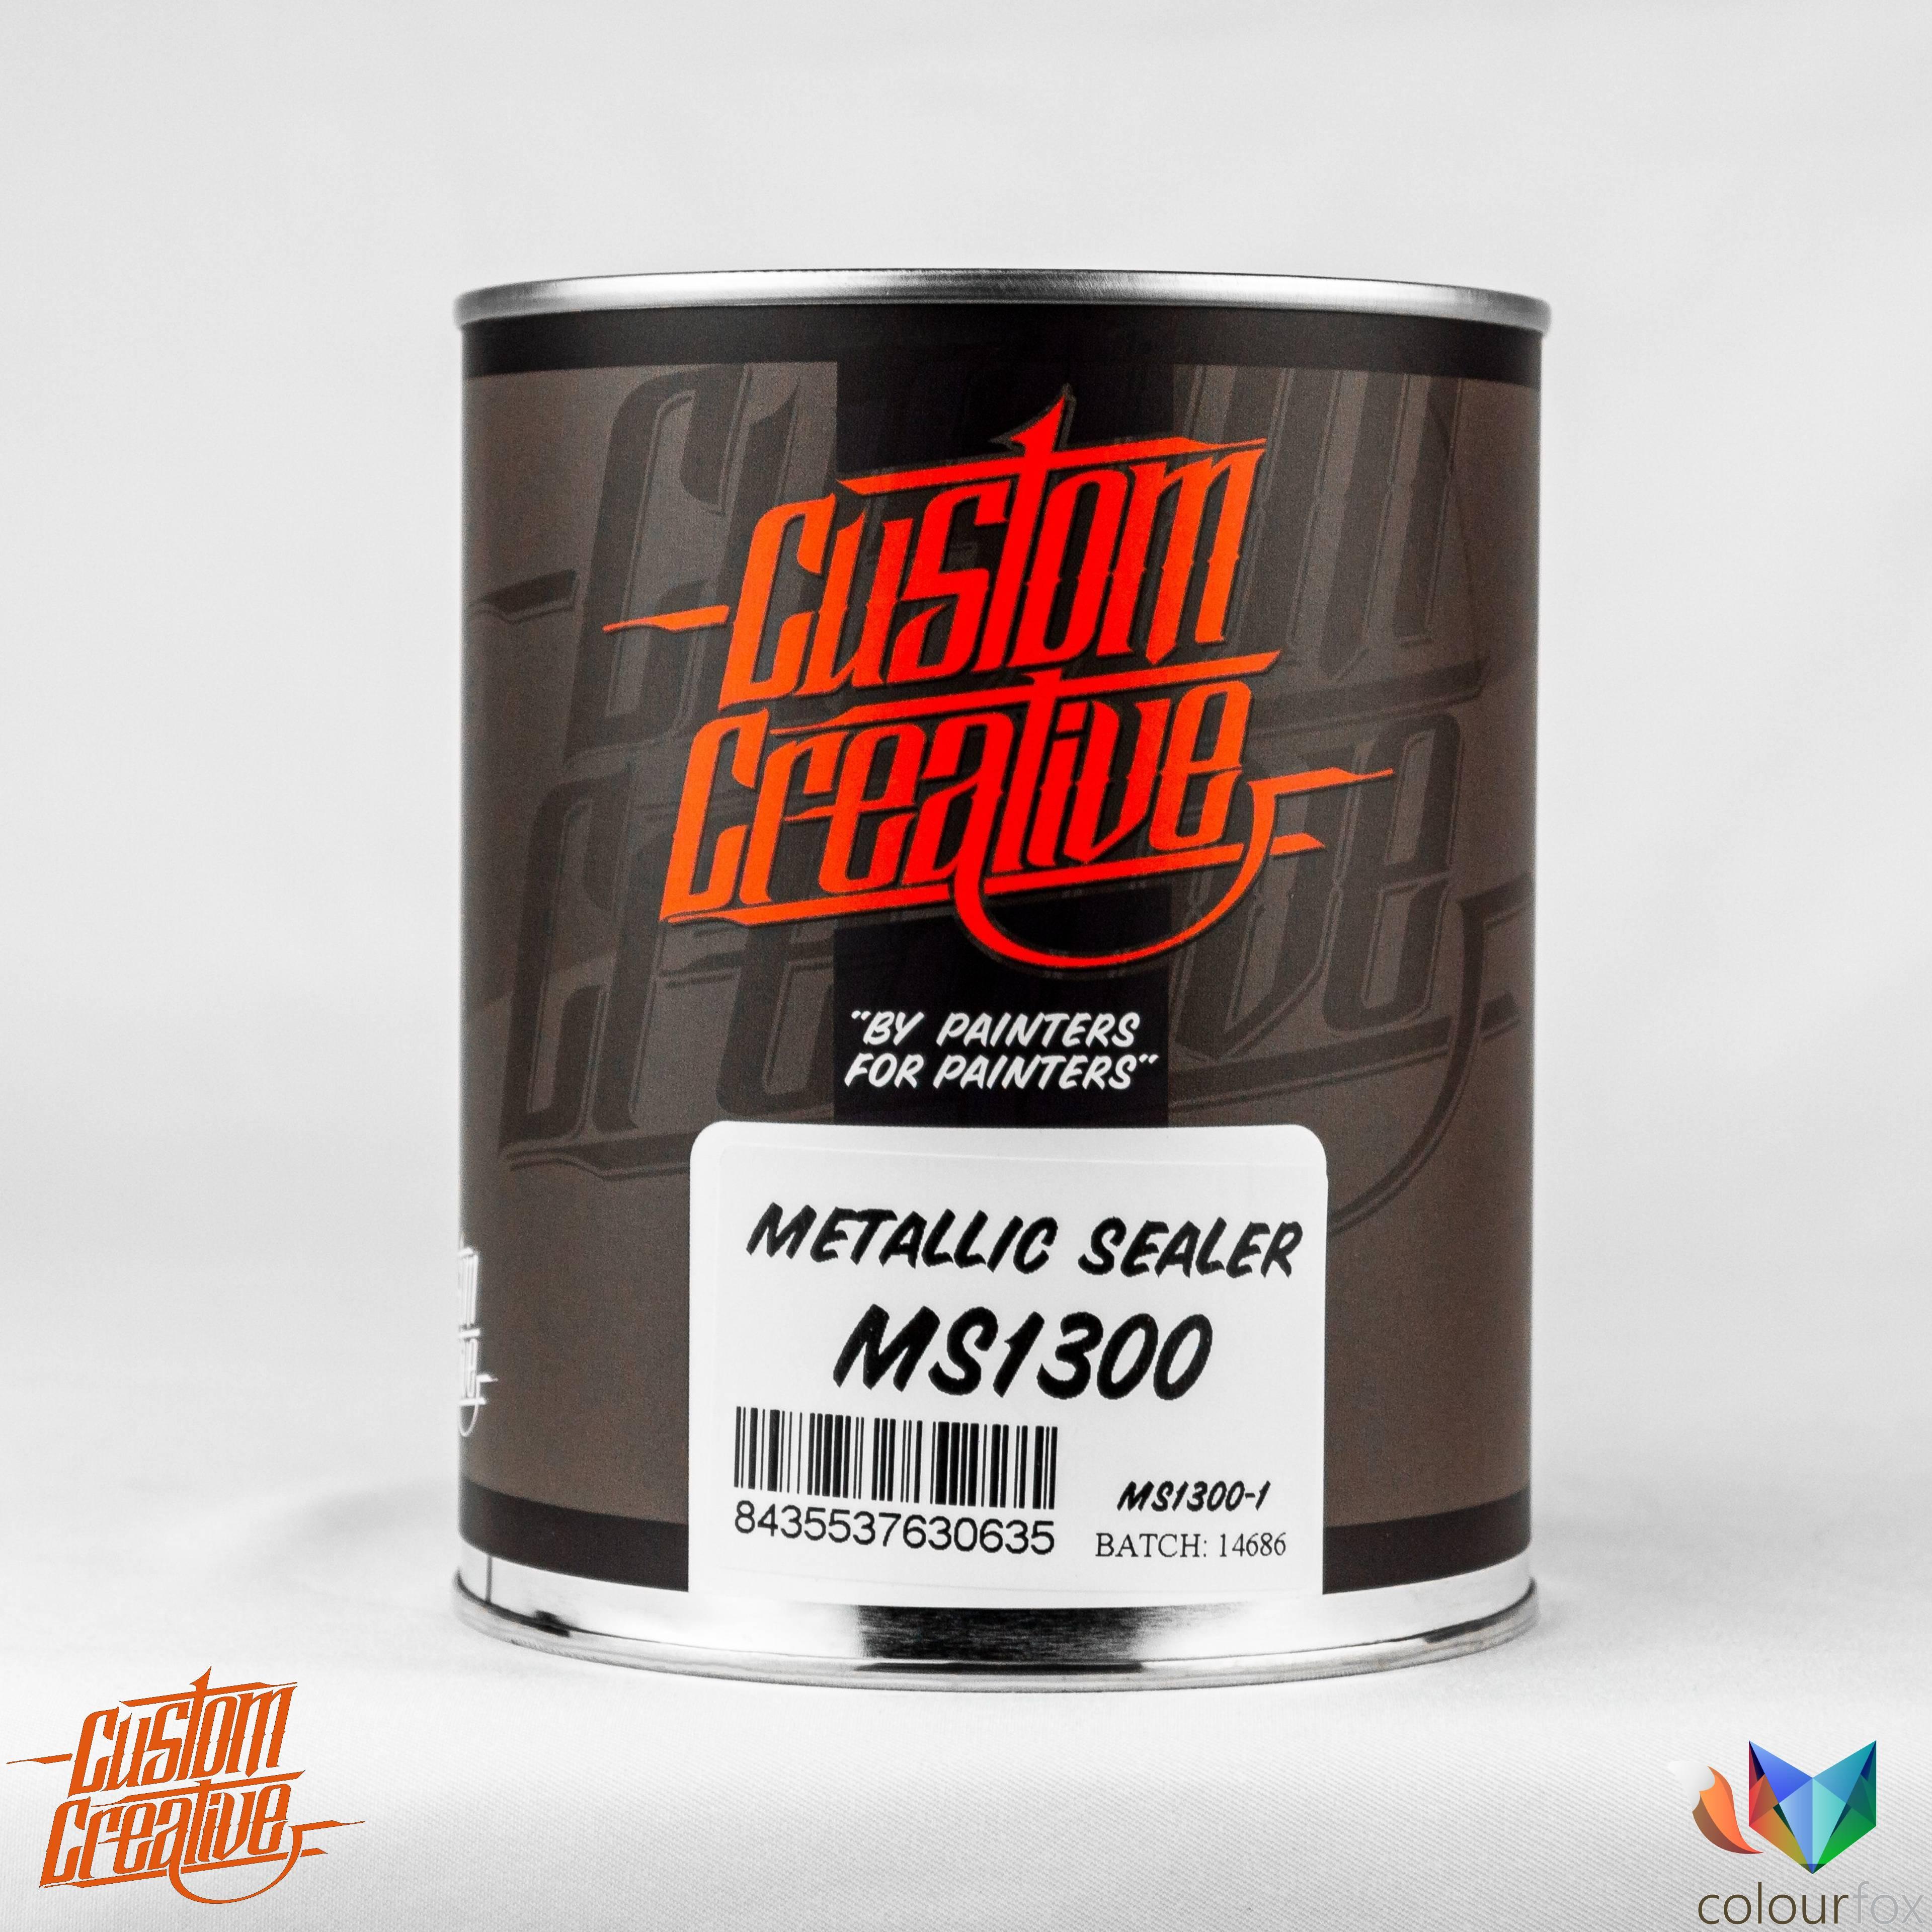 Aparejo metalizado de Custom Creative Metallic Sealer en Colourfox